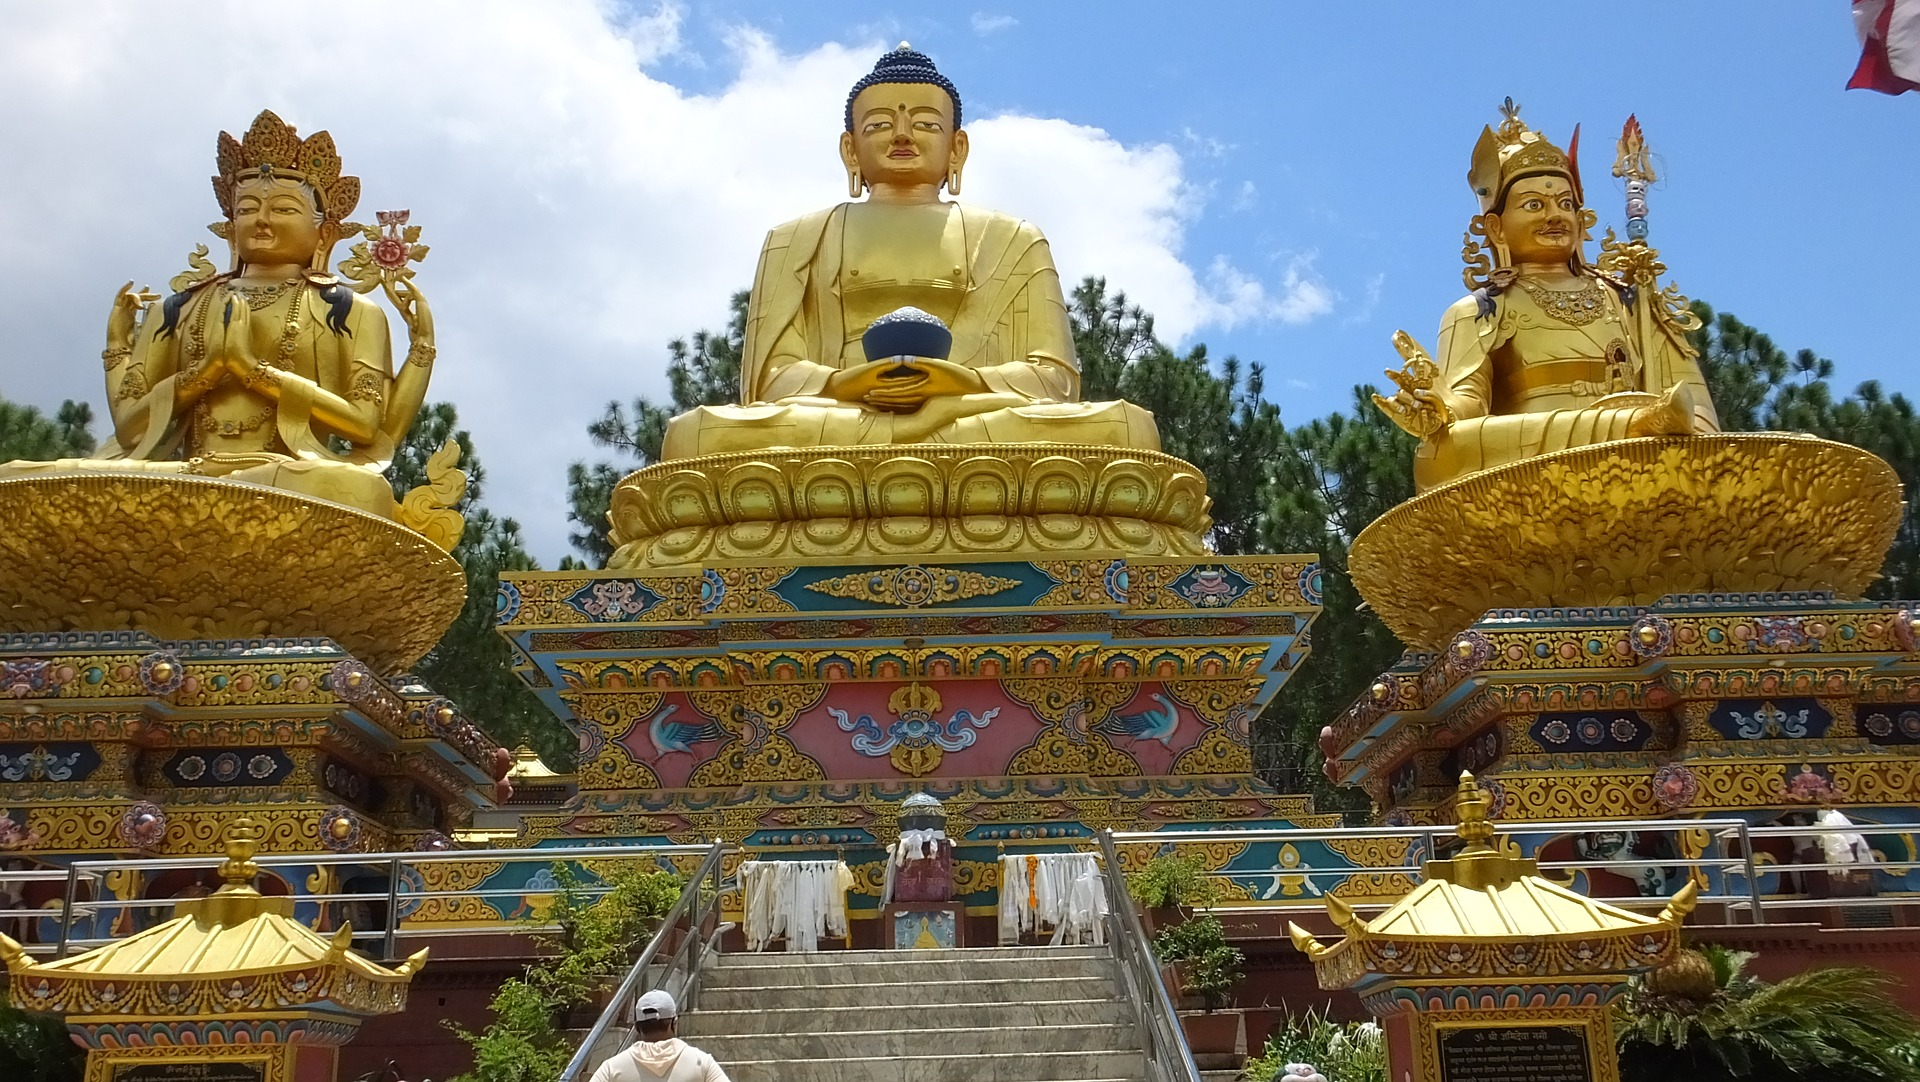 Swayambhu - an ancient religious monument in the Kathmandu Valley.